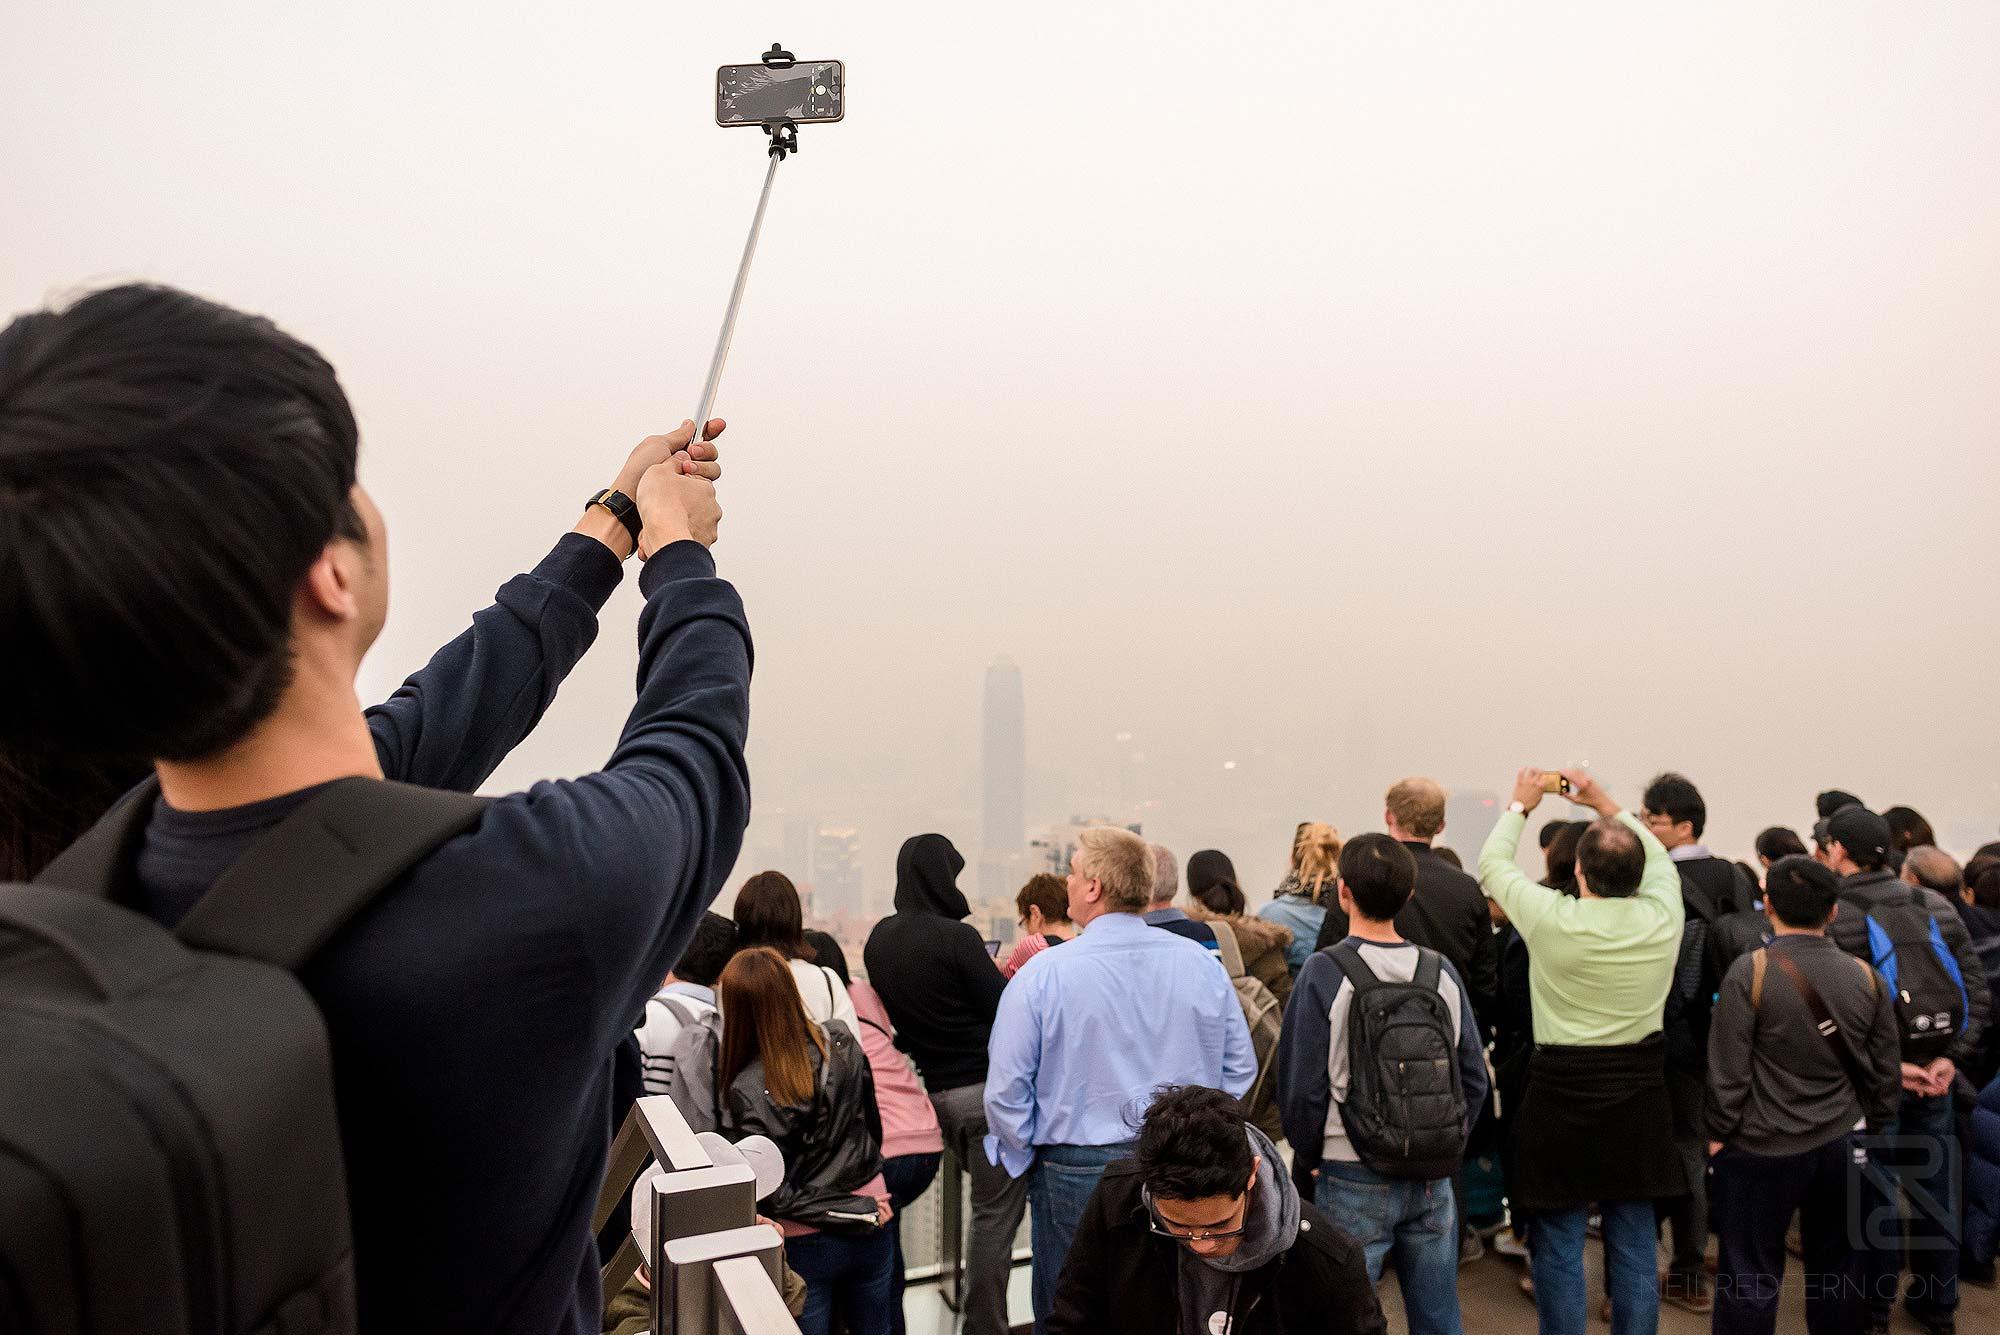 tourists taking photographs at Victoria Peak